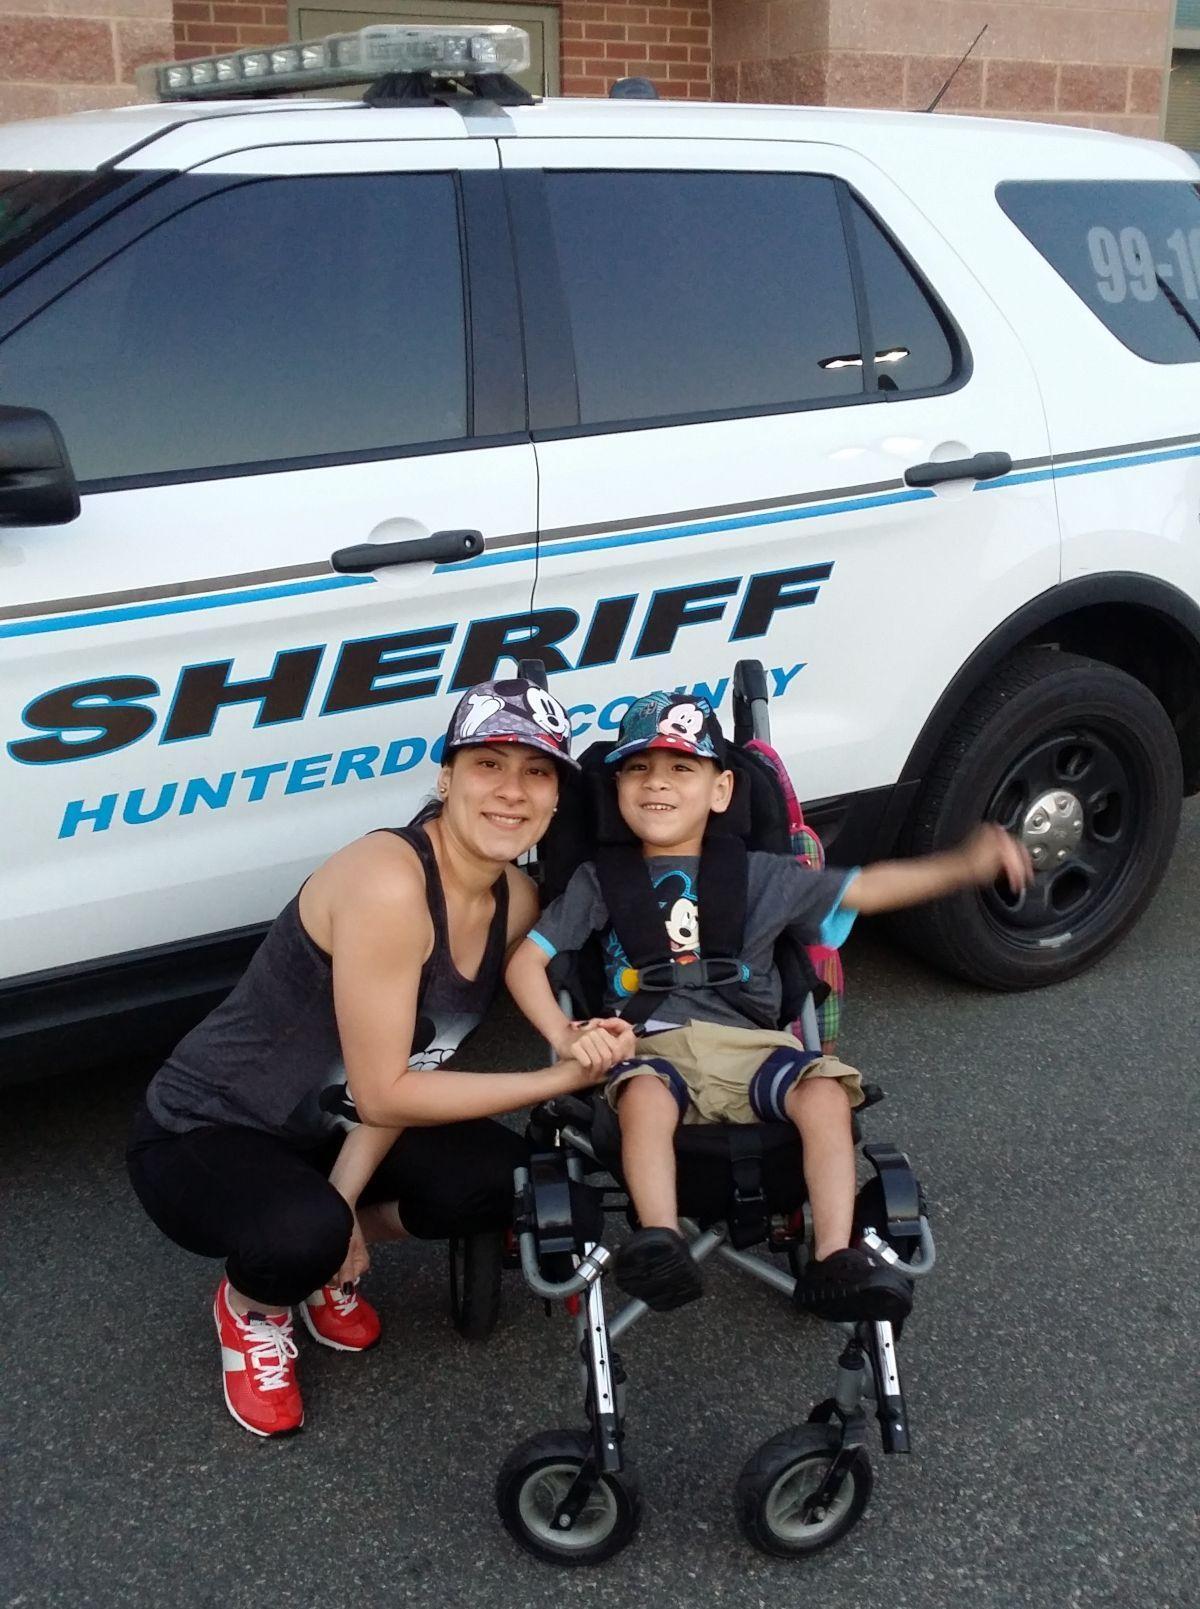 Sheriff's office sends High Bridge boy to Disney World